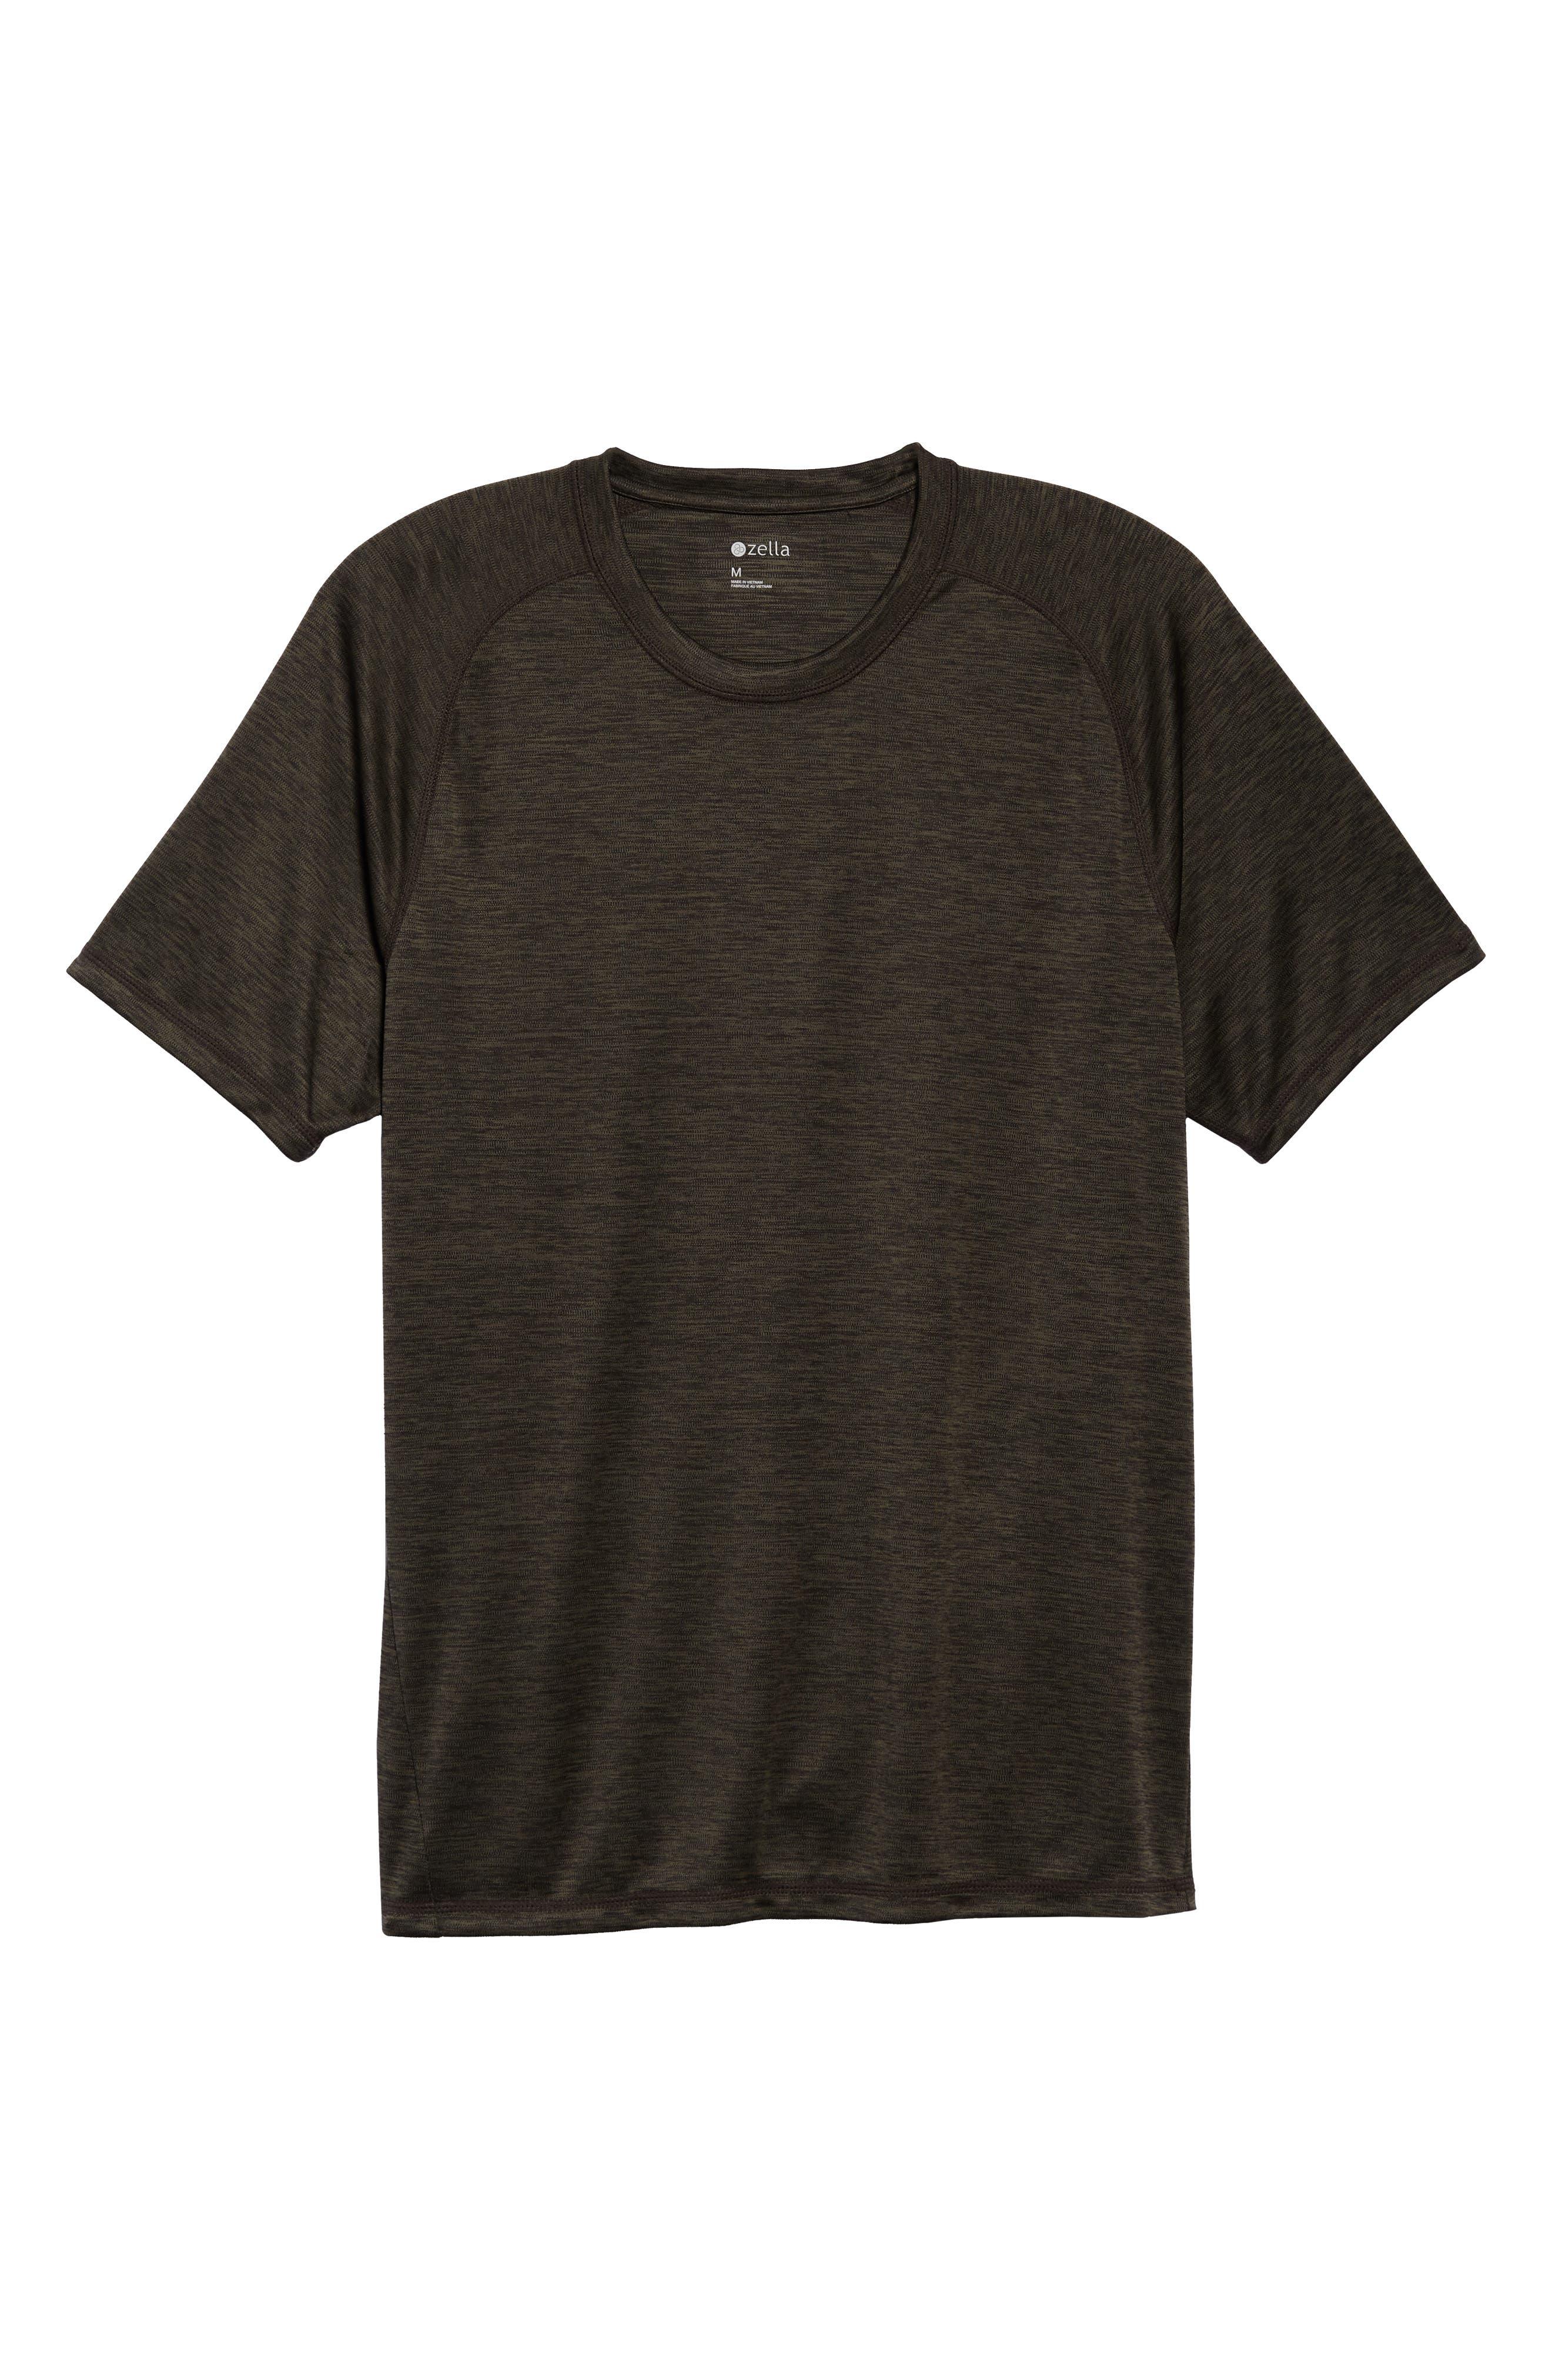 Triplite T-Shirt,                             Alternate thumbnail 73, color,